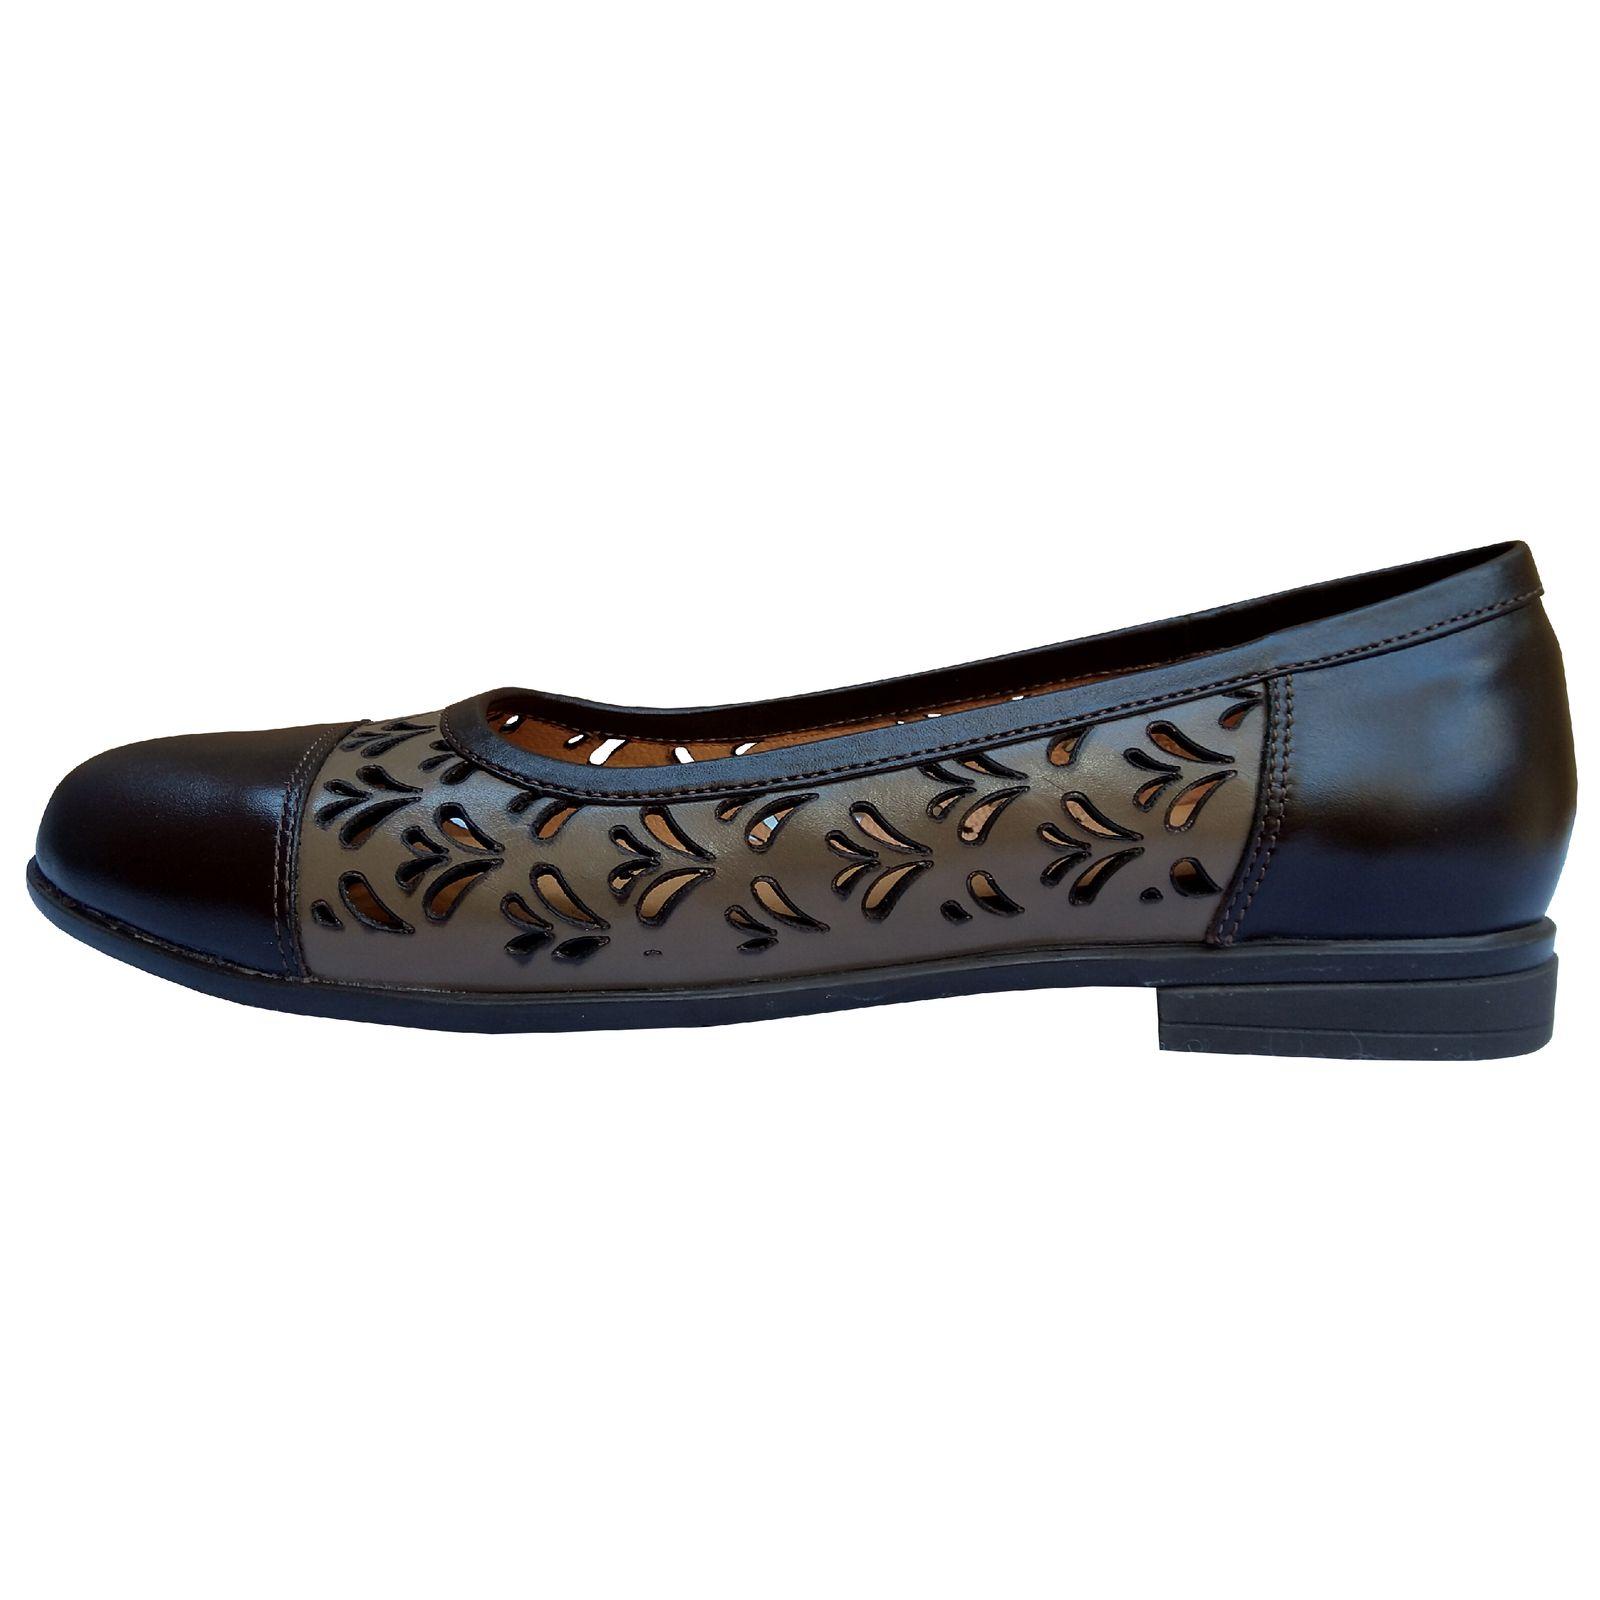 کفش زنانه مدل SK 310 -  - 2